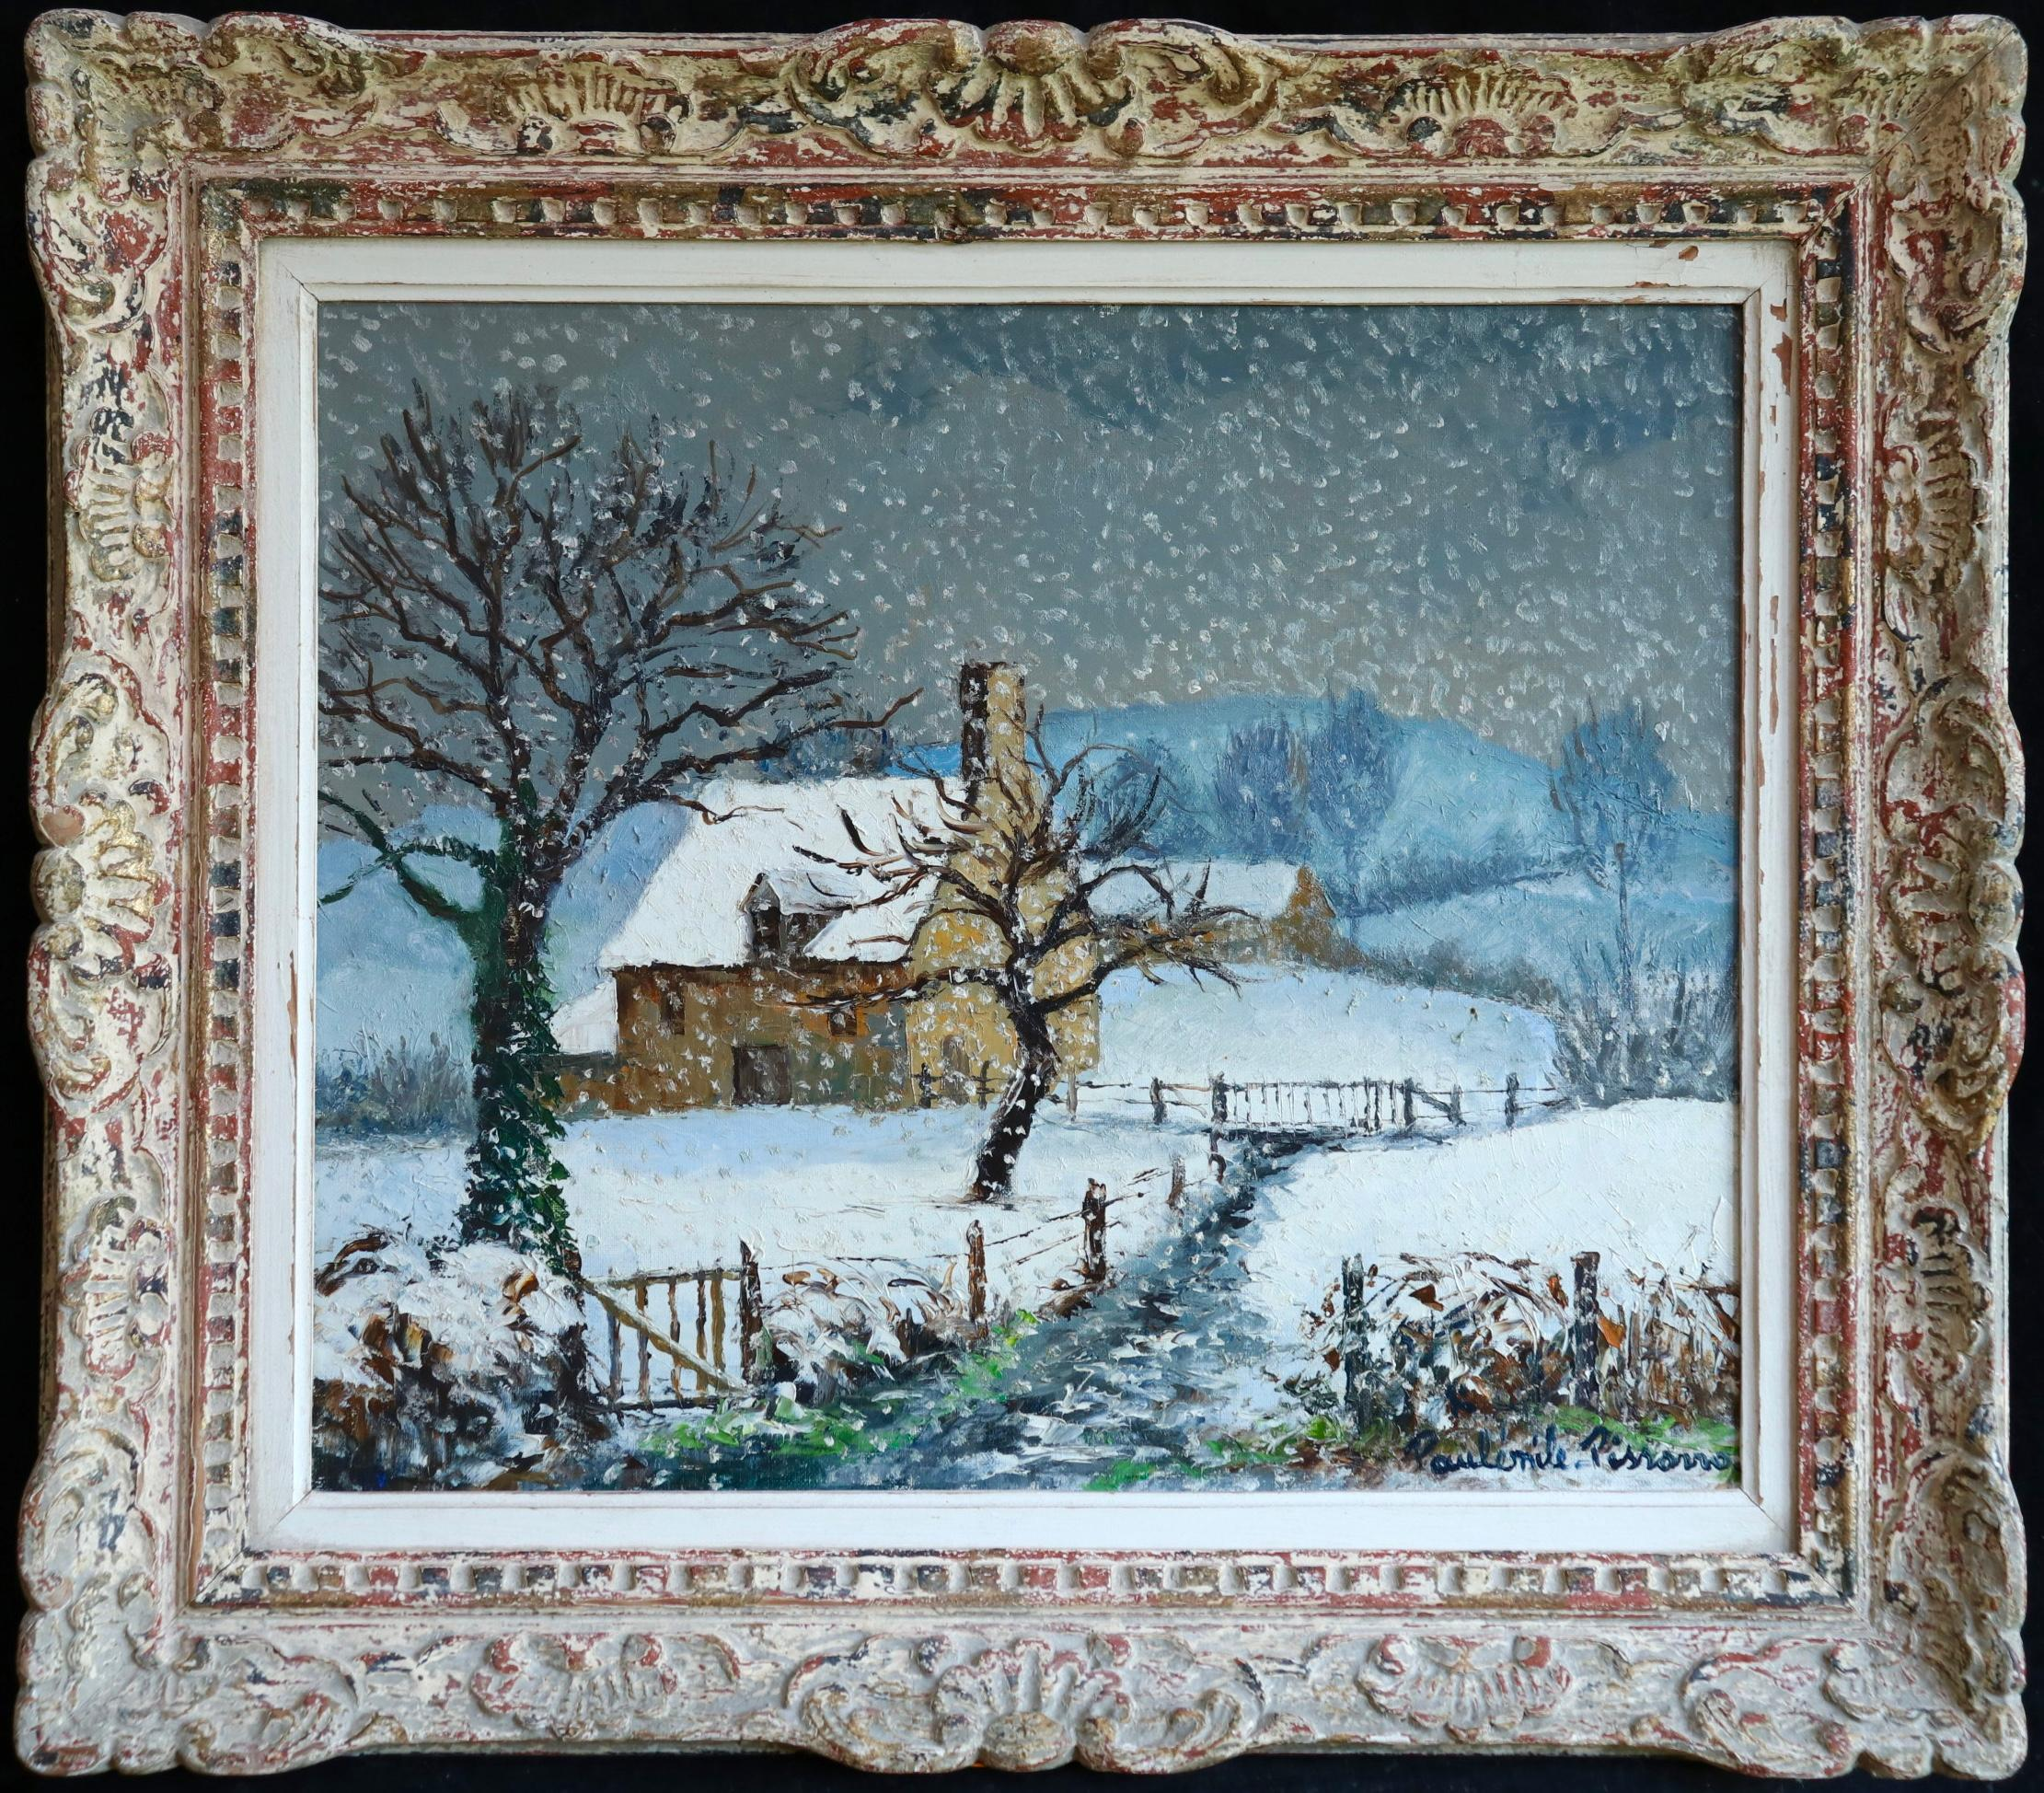 Winter Landscape - Ferme Olivier  large Impressionist oil by Paul Emile Pissarro